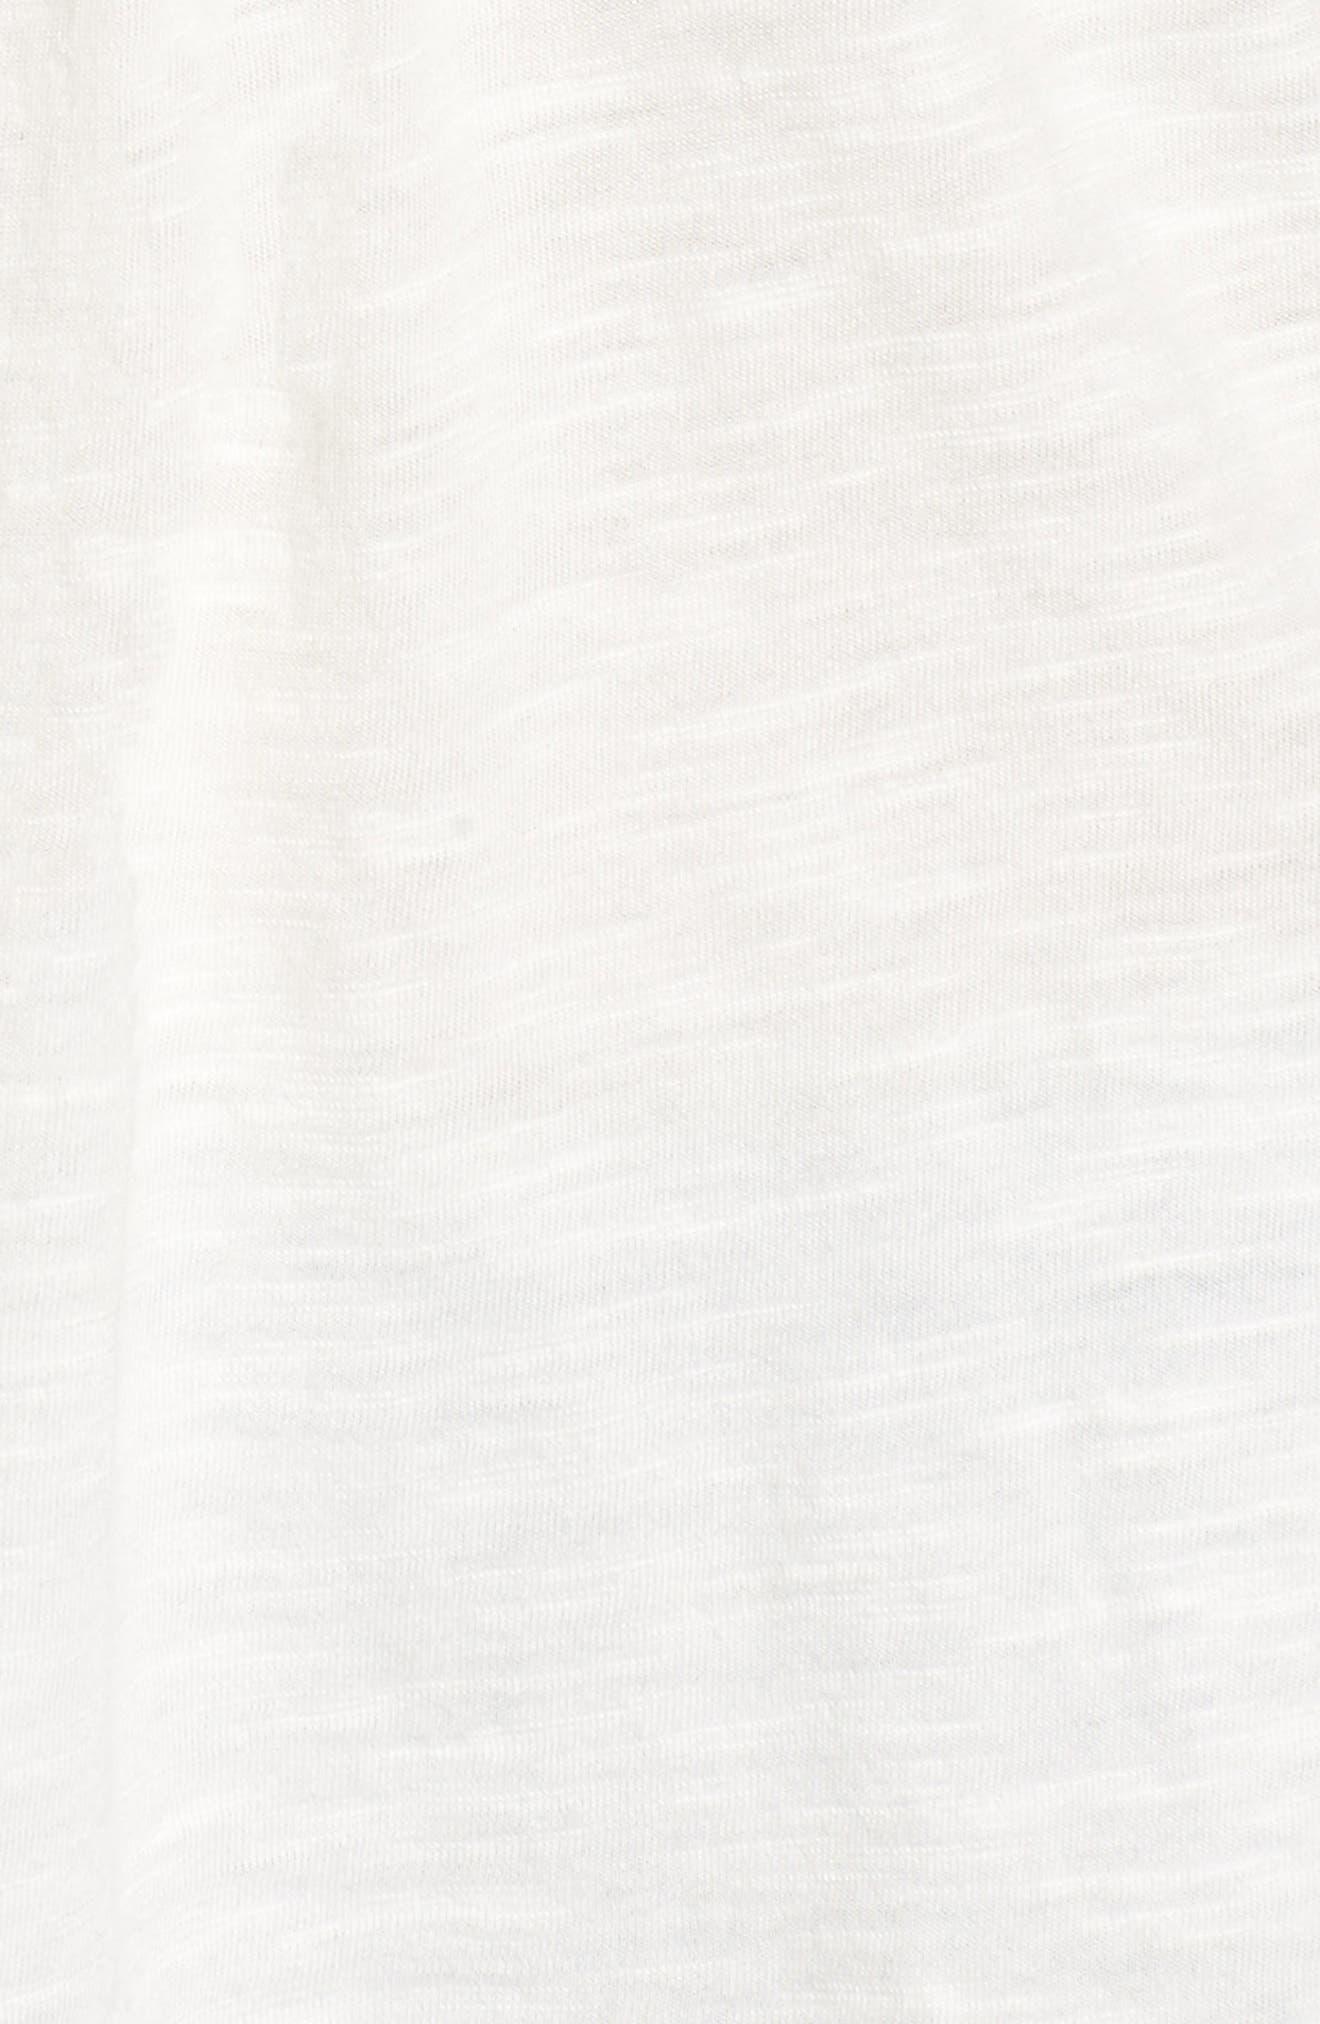 Tassel Trim Embroidered Tank,                             Alternate thumbnail 30, color,